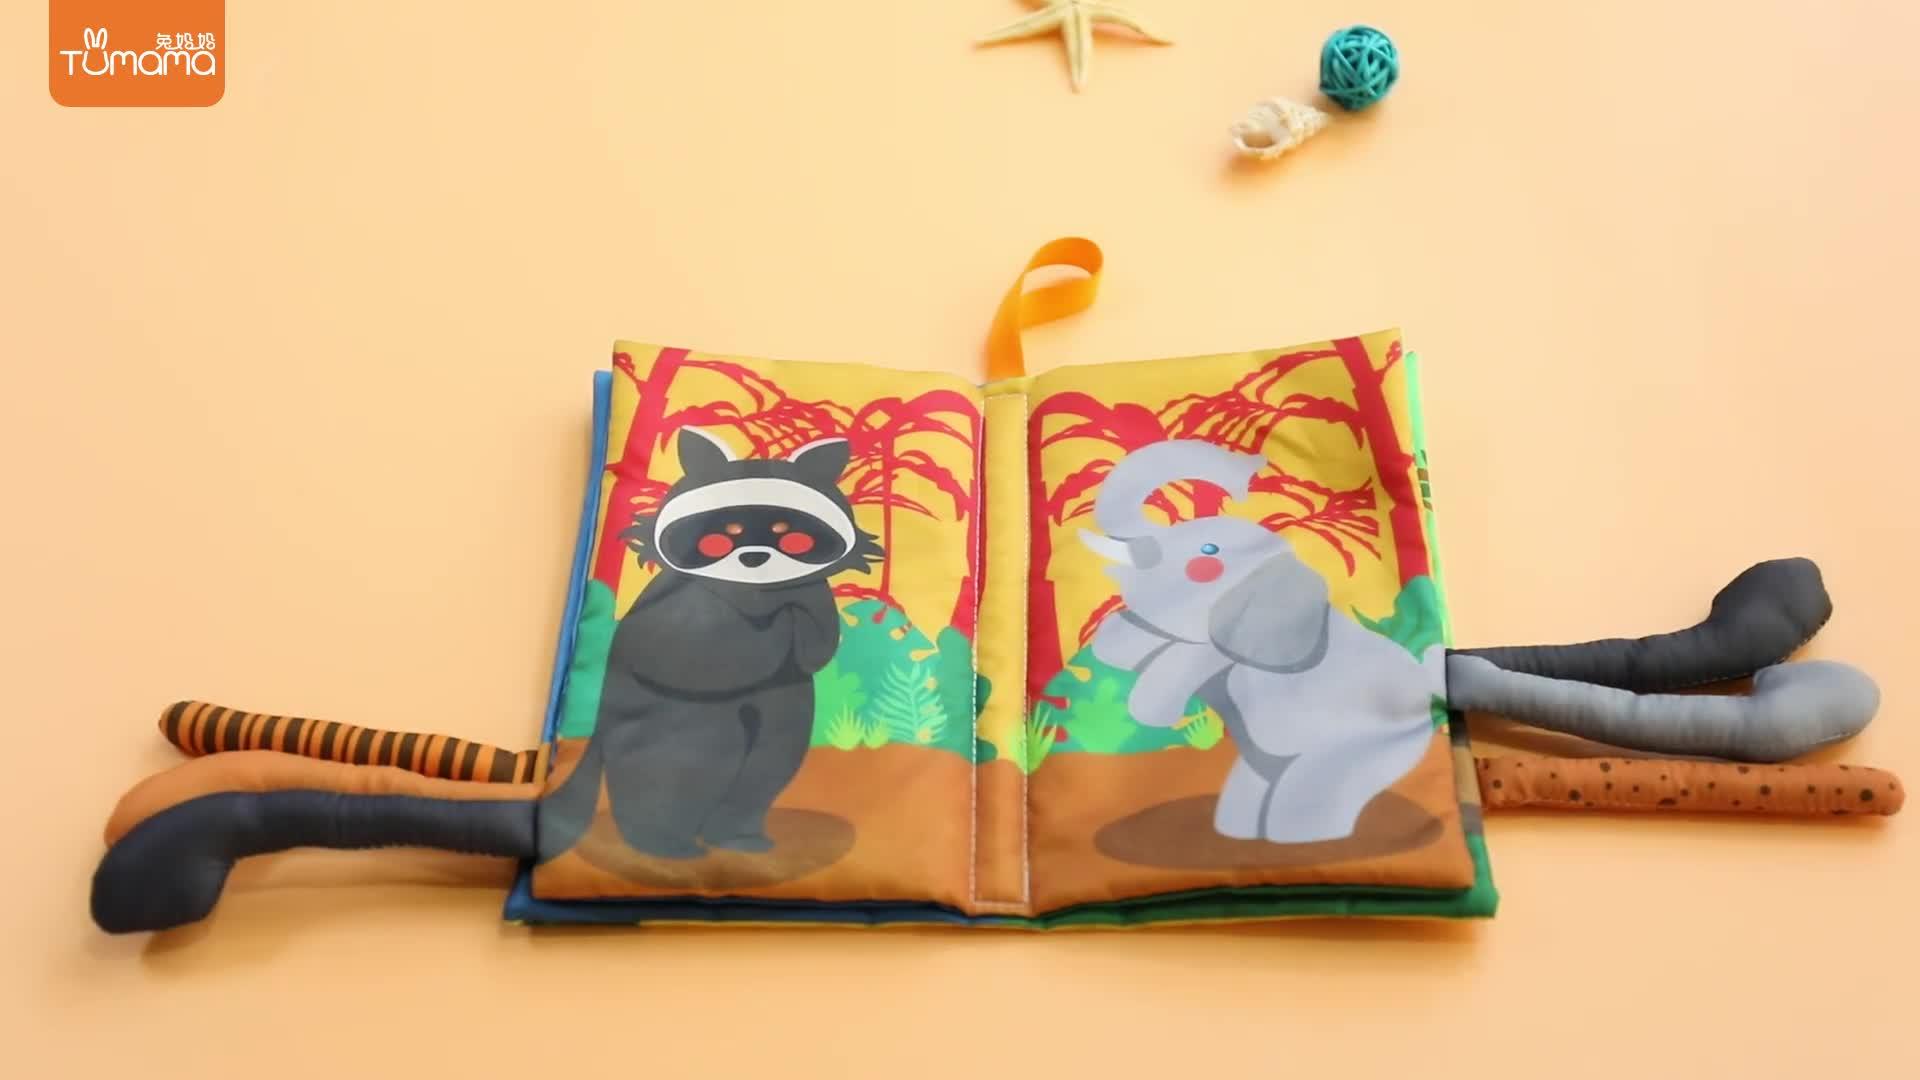 Educational  kids lamaze children jollybaby fabric soft baby cloth tail  book set